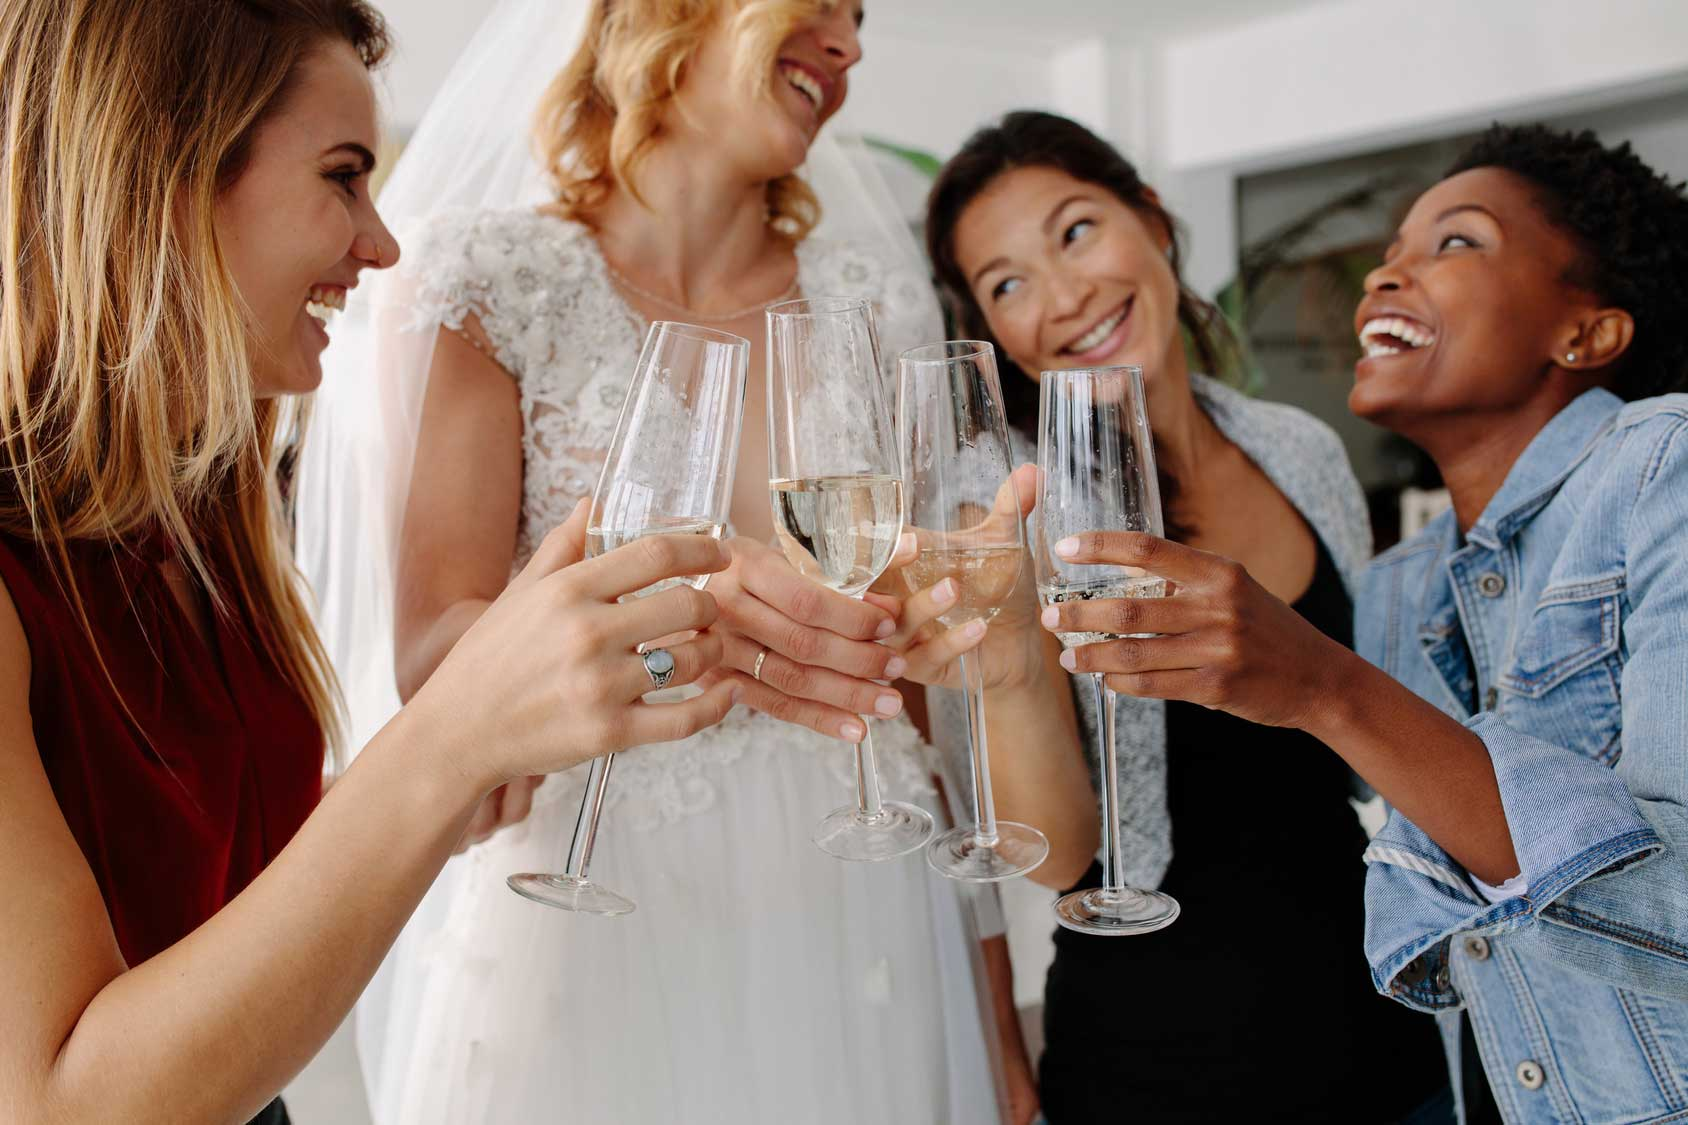 Bridal Wedding Image Gallery